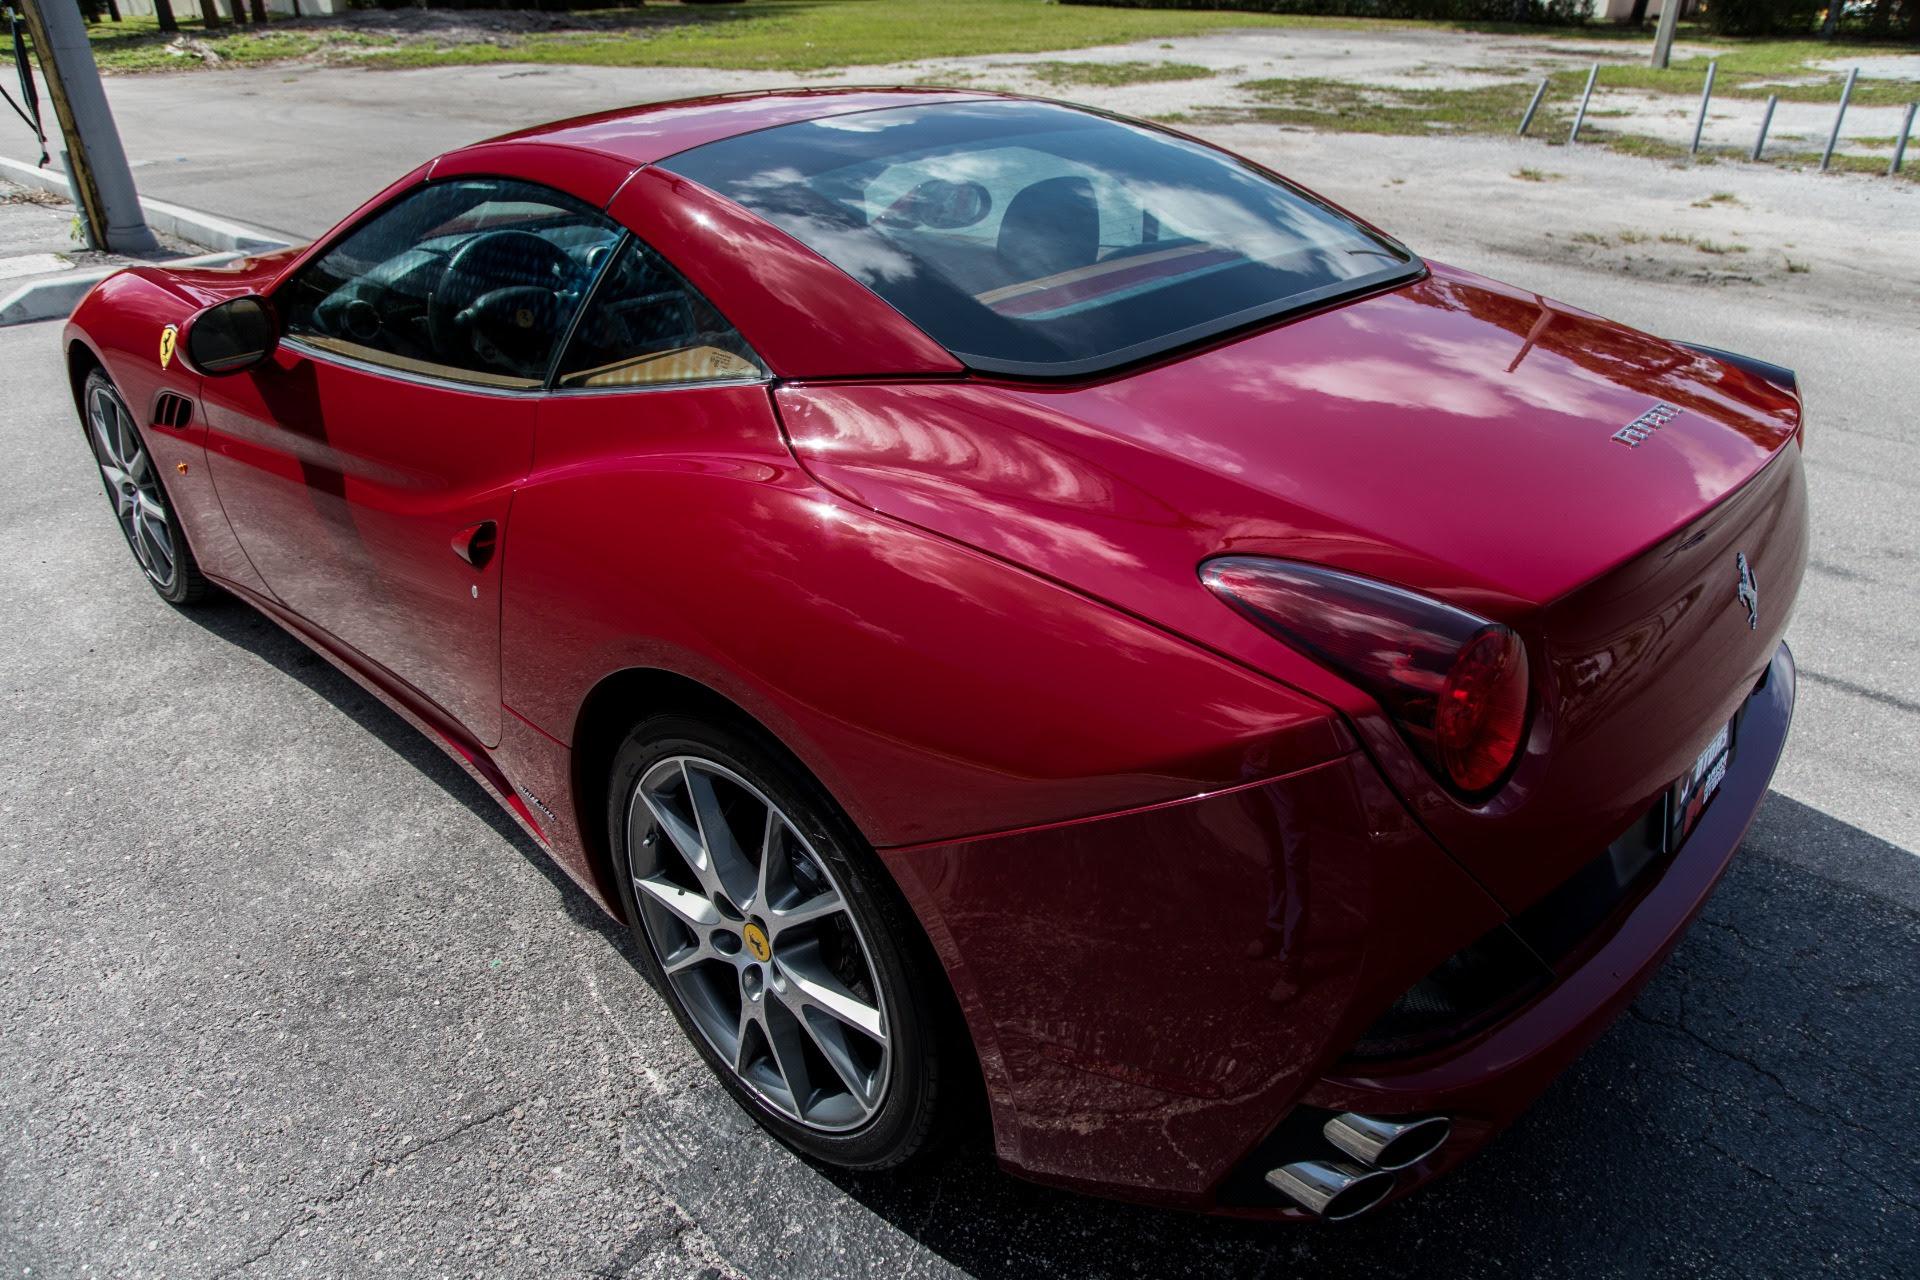 Used 2011 Ferrari California For Sale ($89,900)   Marino ...